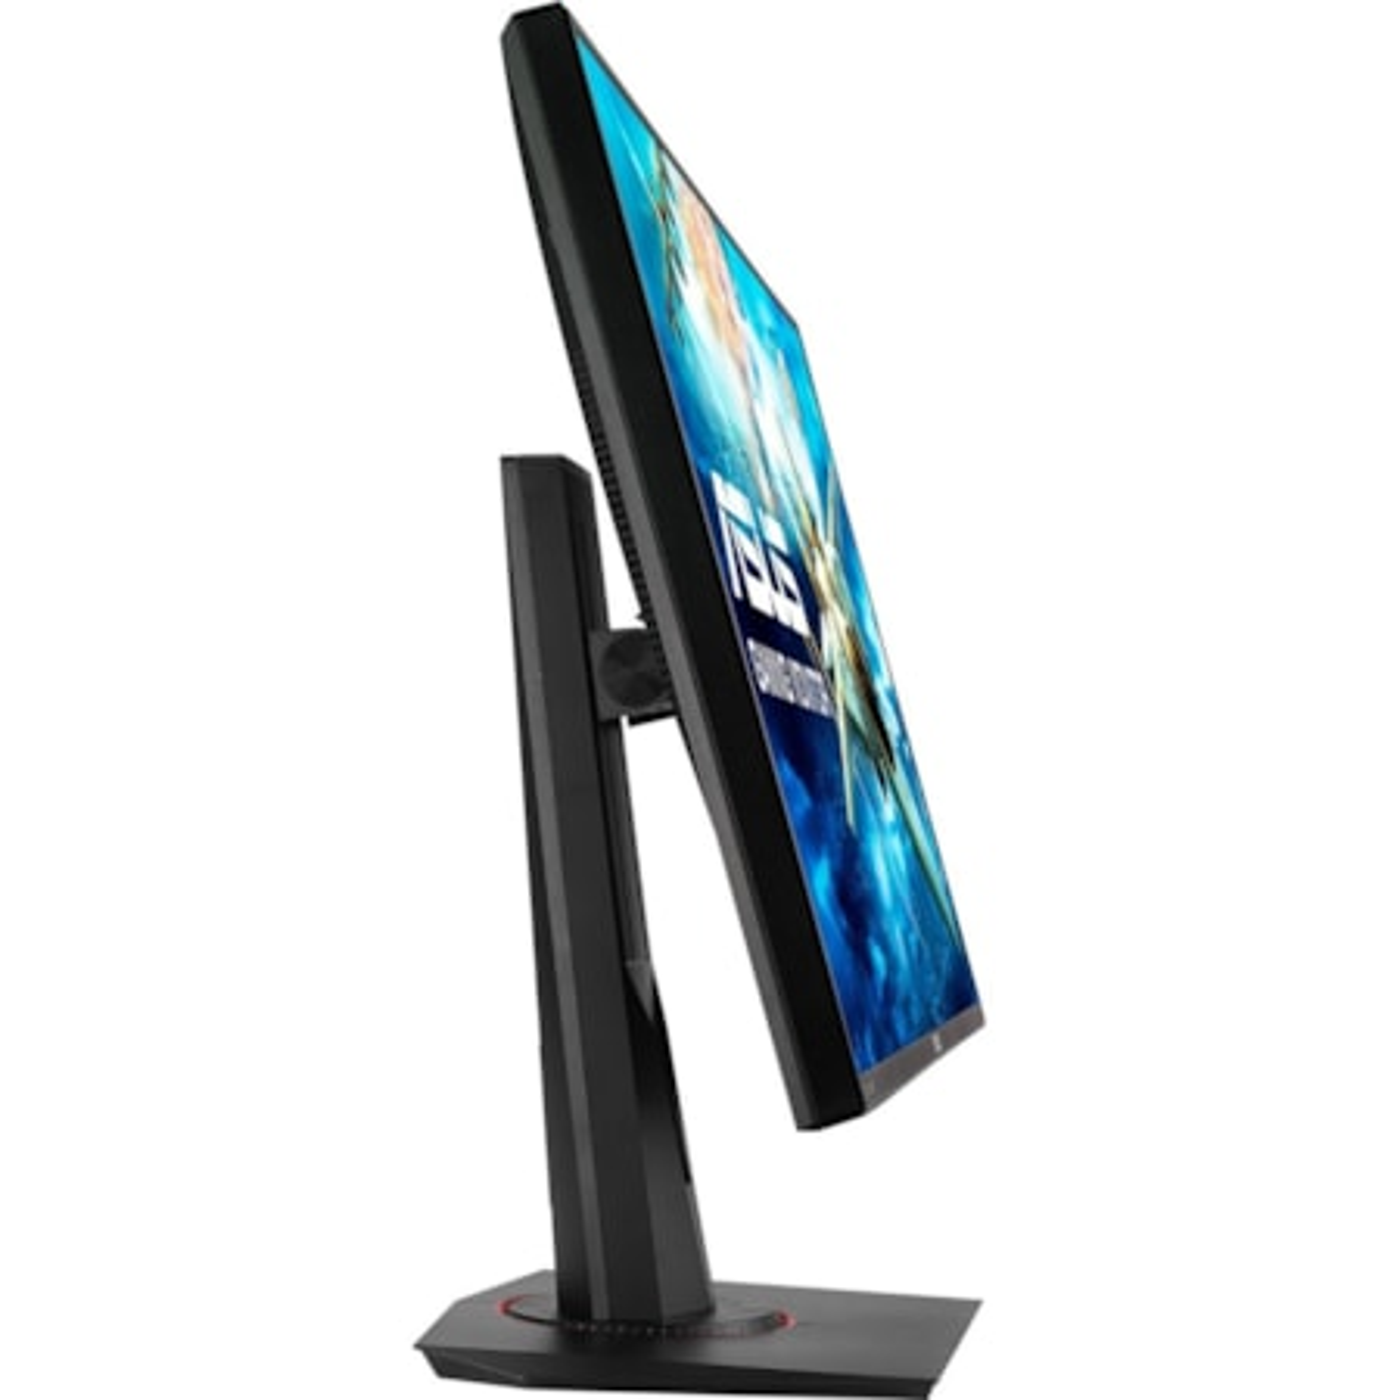 "Asus VG278QR 68.6 cm (27"") Full HD LED Gaming LCD Monitor - 16:9 - Black"